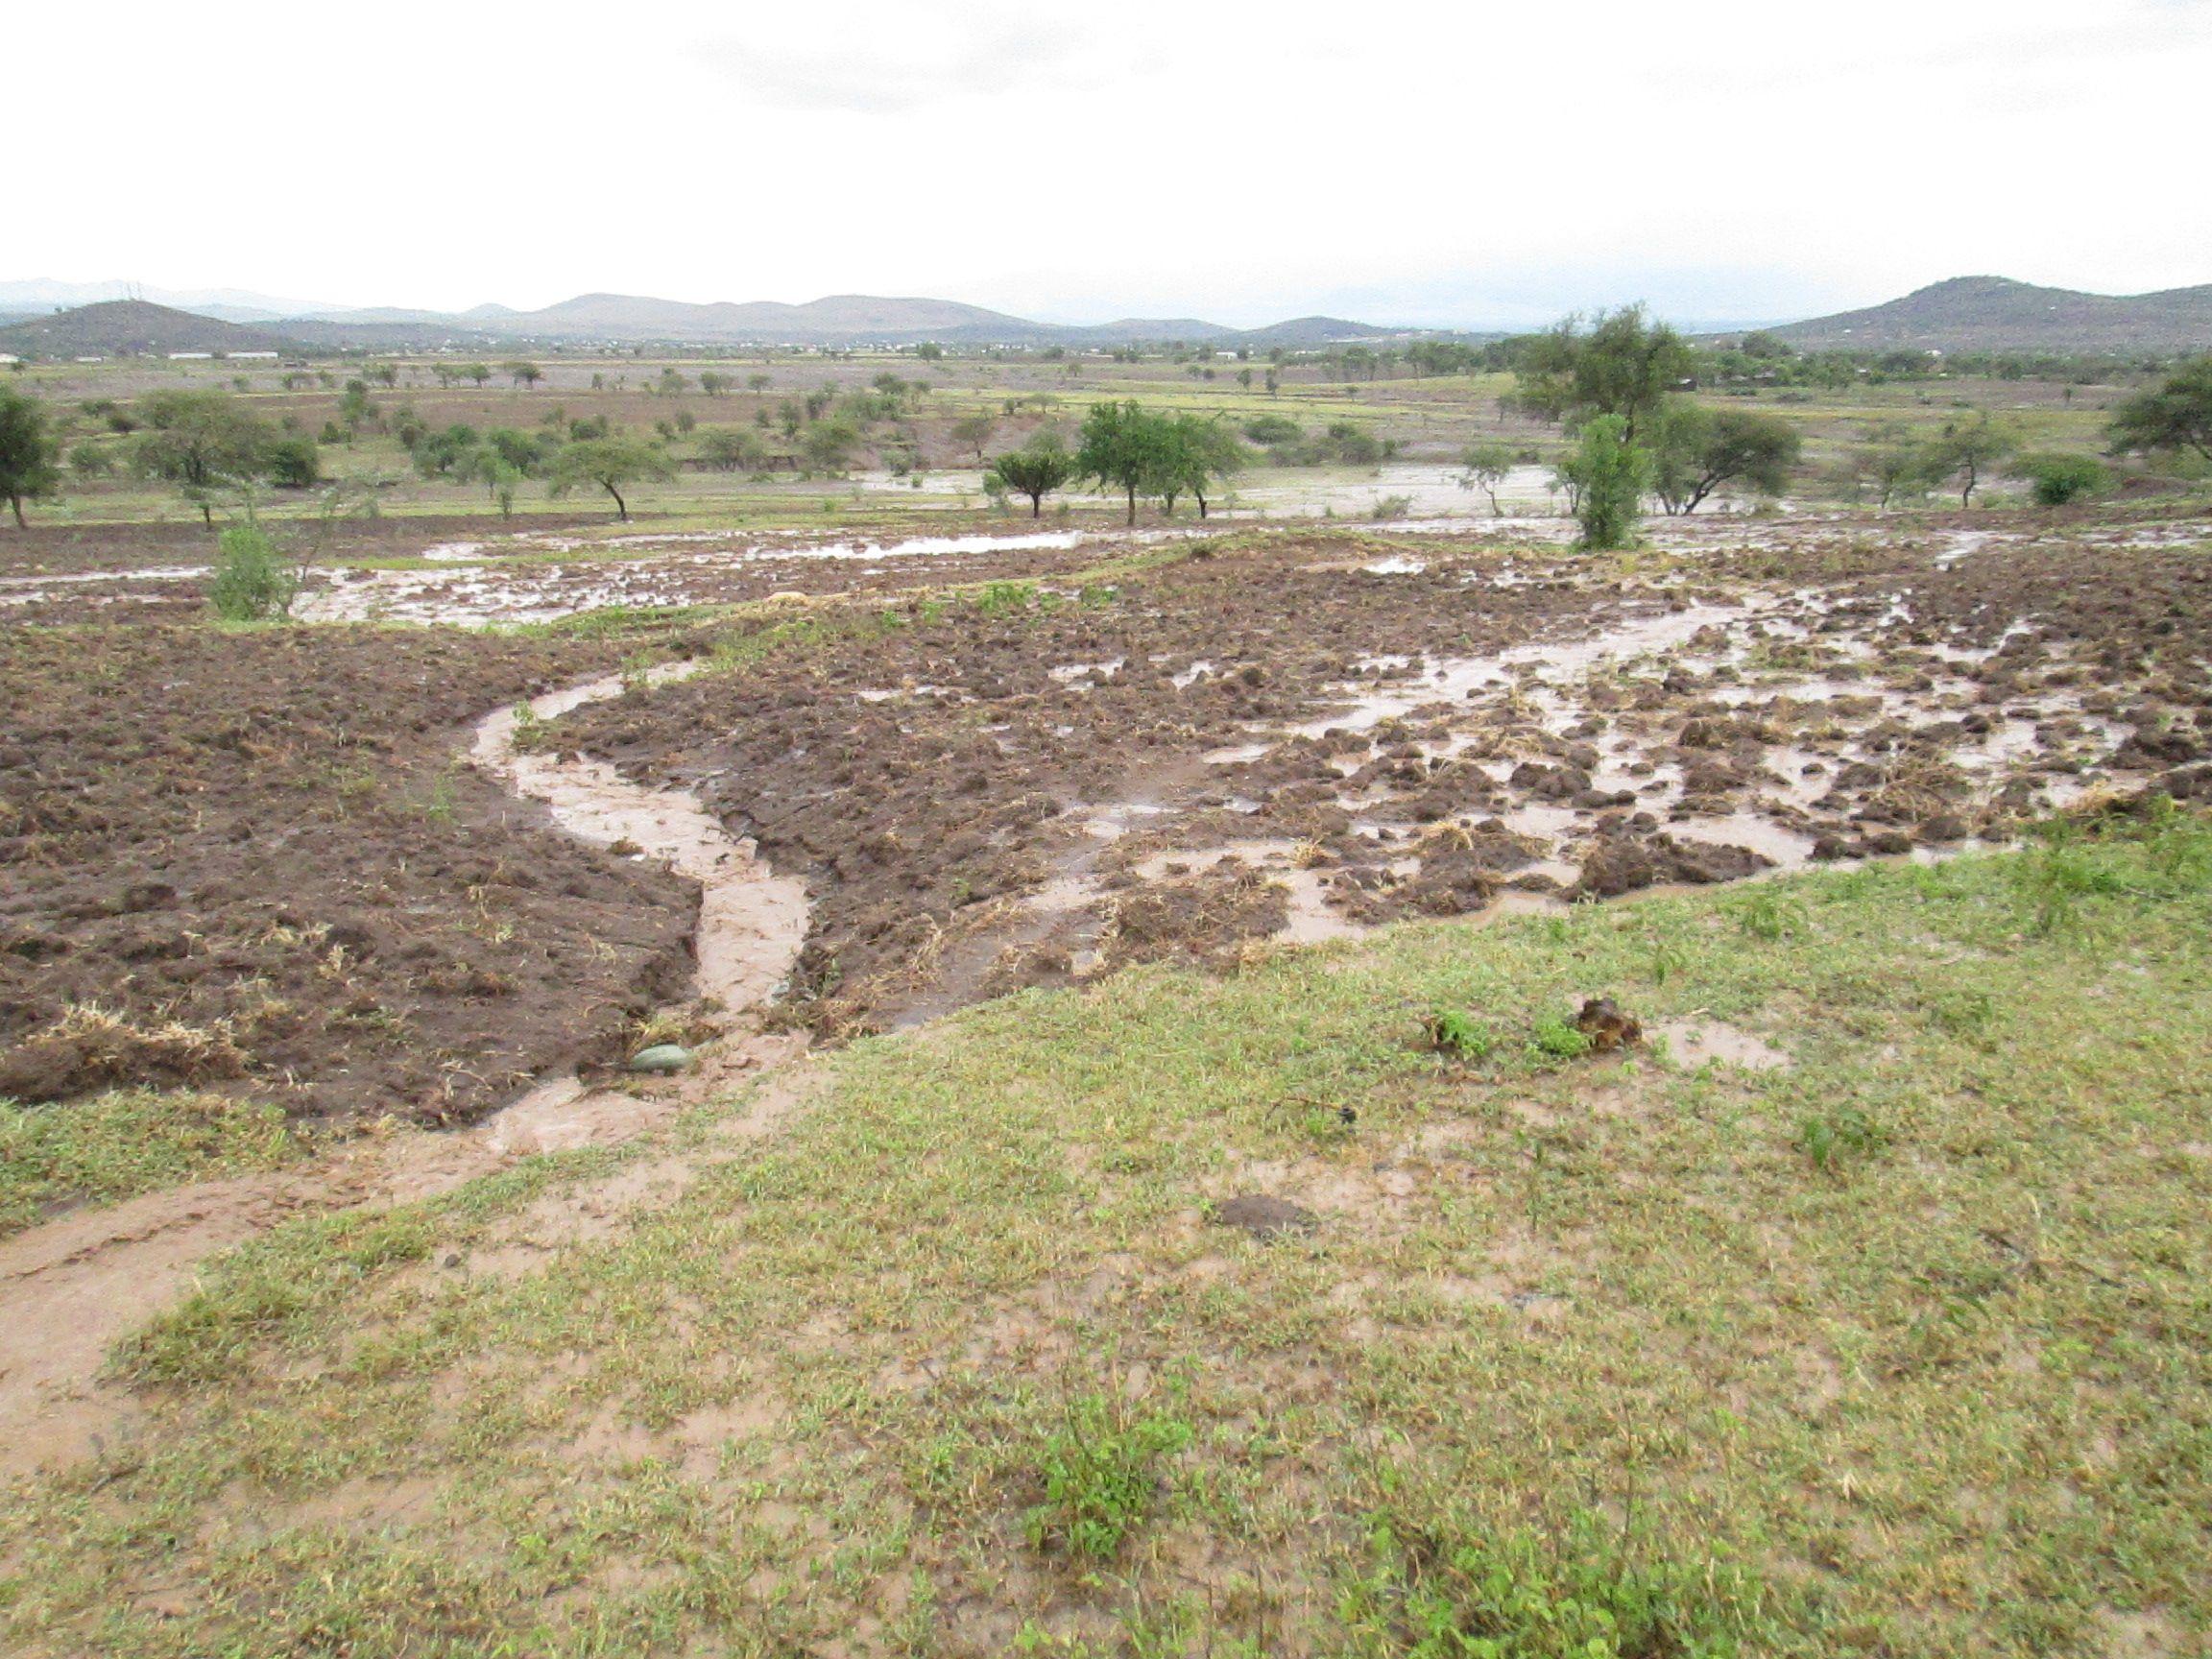 Overland flow following 32 mm of rainfall over ~45 min near Kisongo, Tanzania.